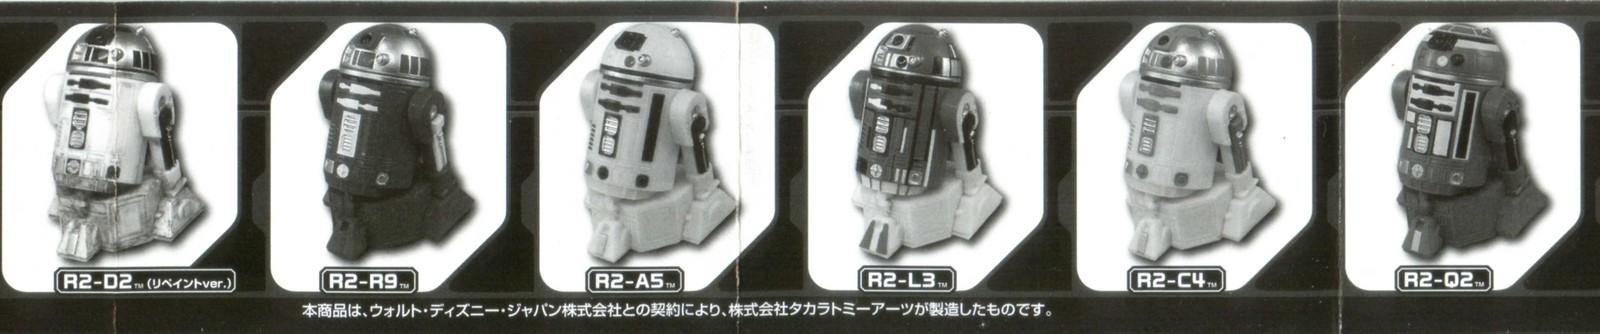 TAKARA TOMY STAR WARS Characters GACHA GALAXY PULLBACK DROID Phase 2 Full Set